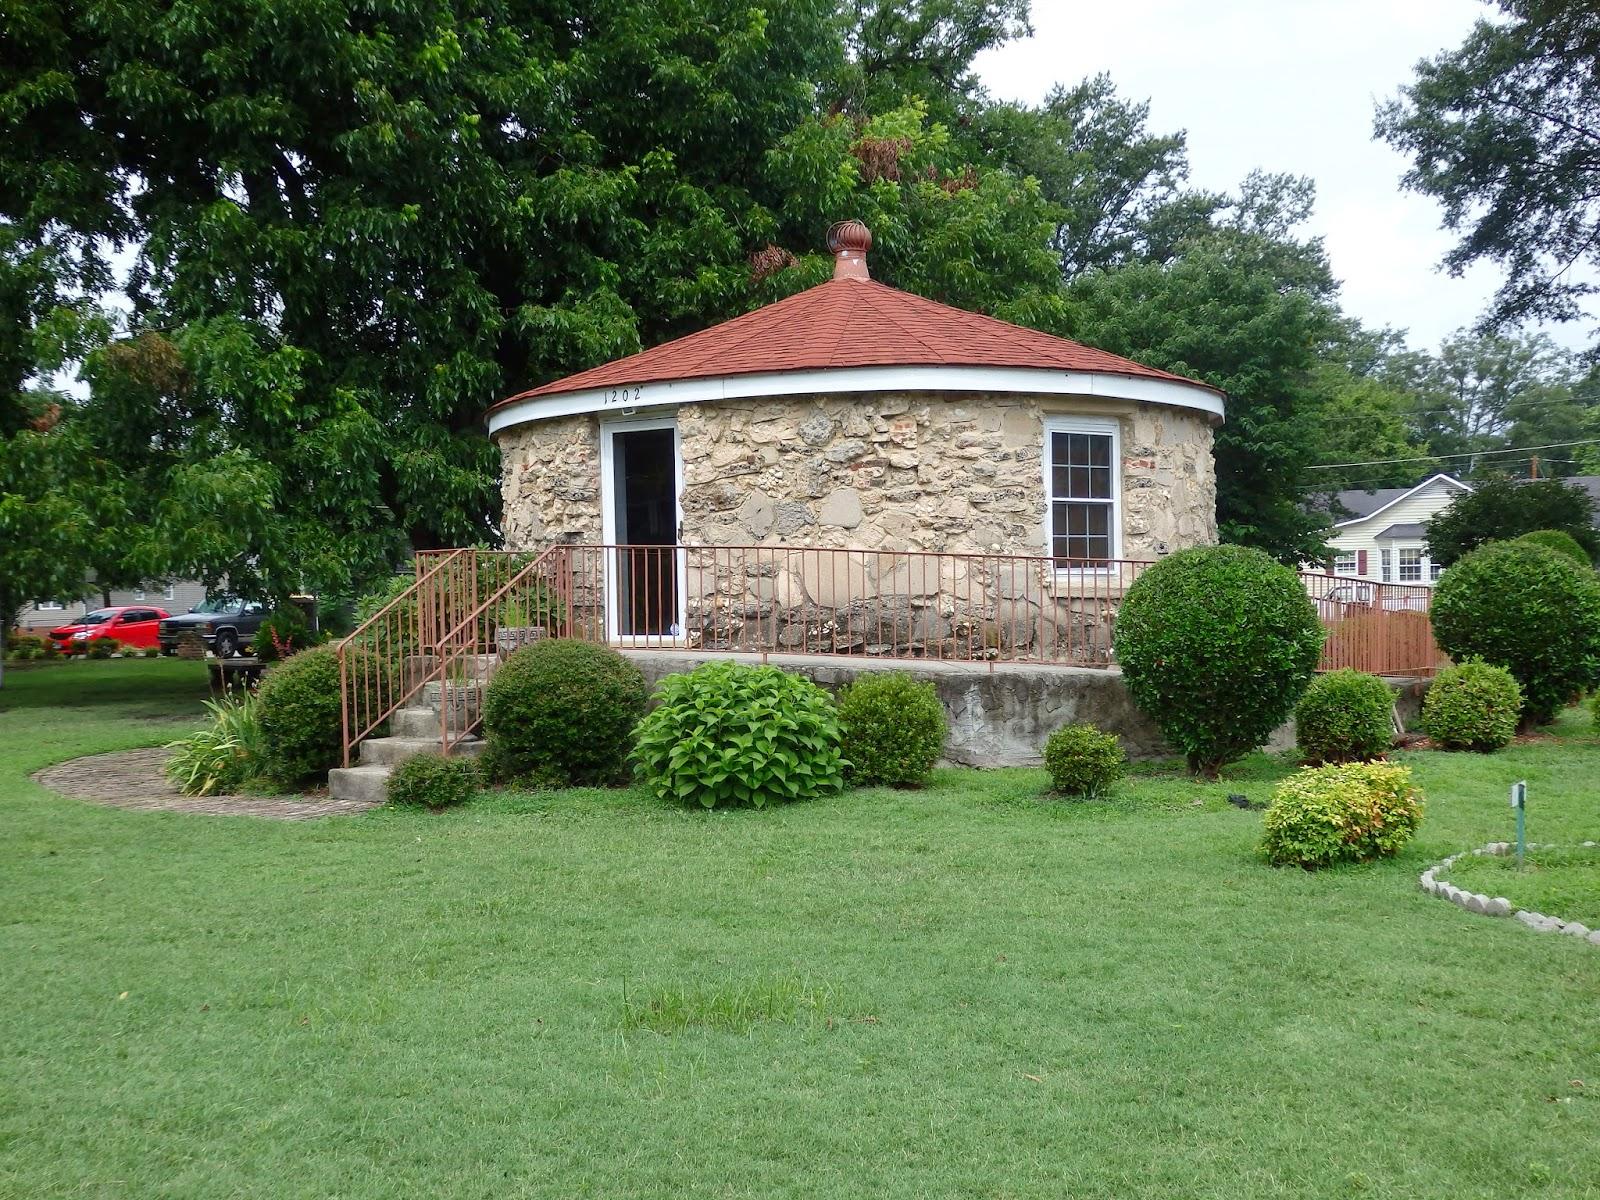 The Freeman Roundhouse Museum